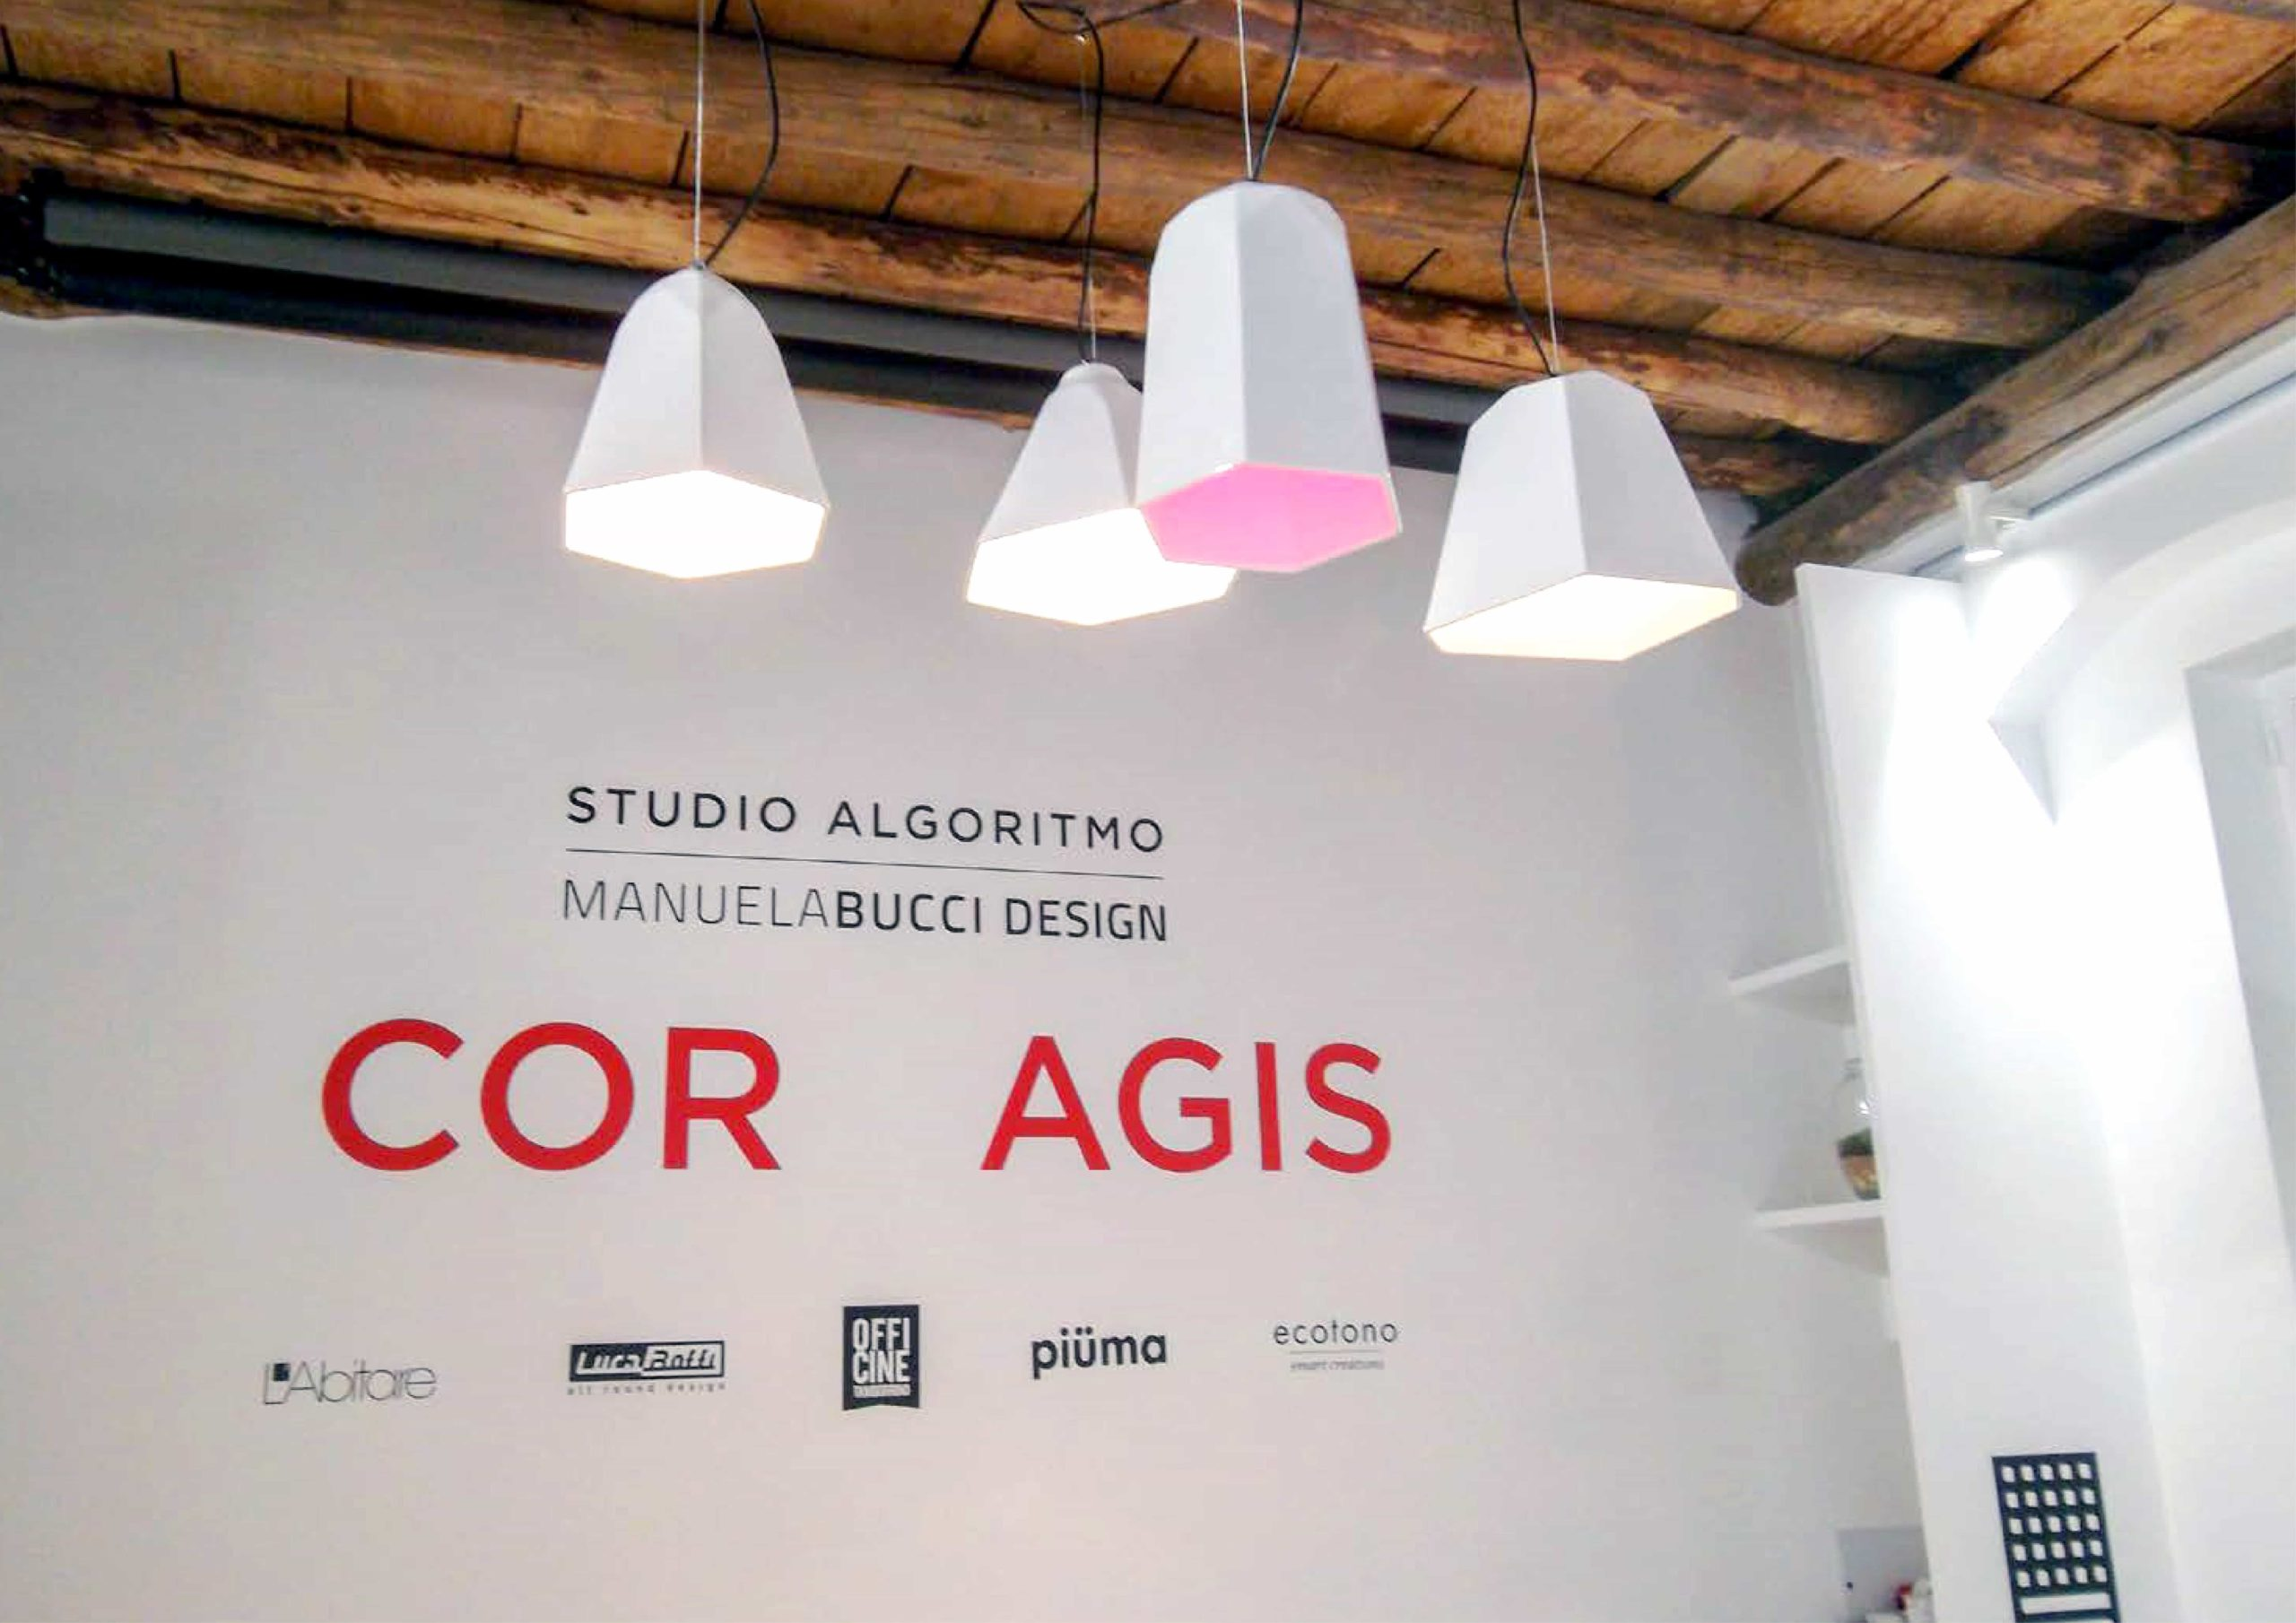 Cor Agis